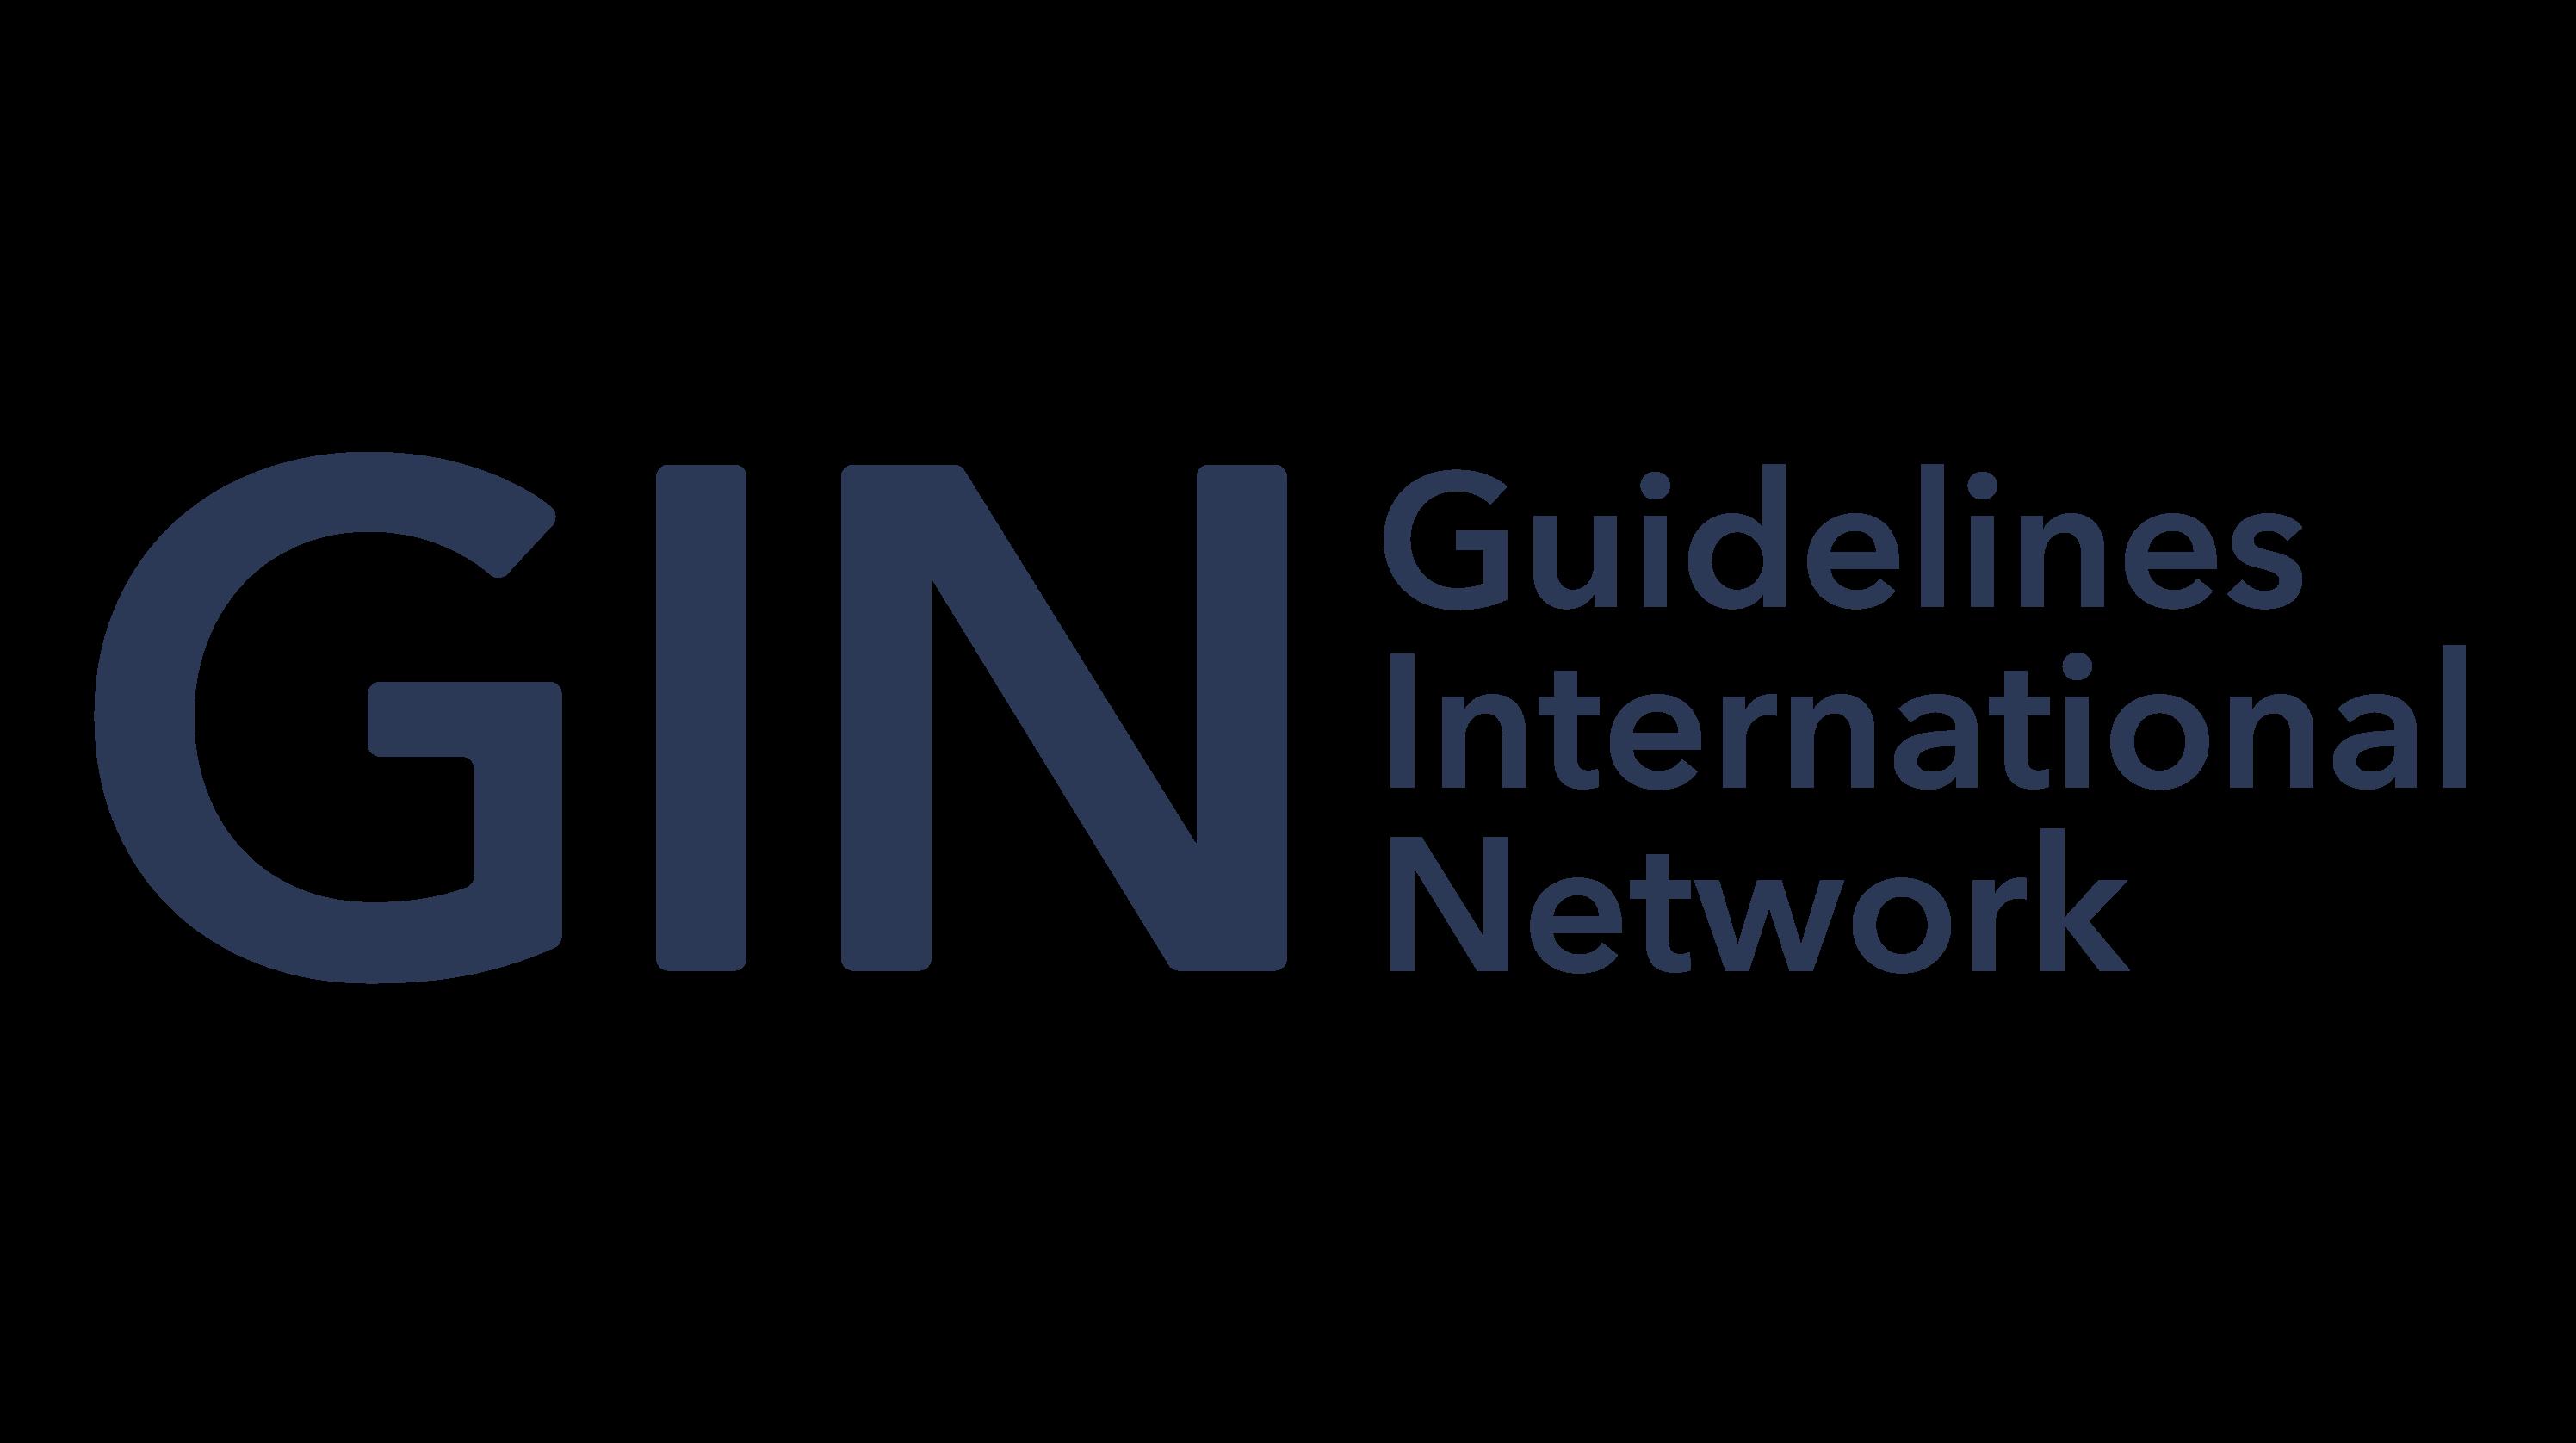 Guidelines International Network